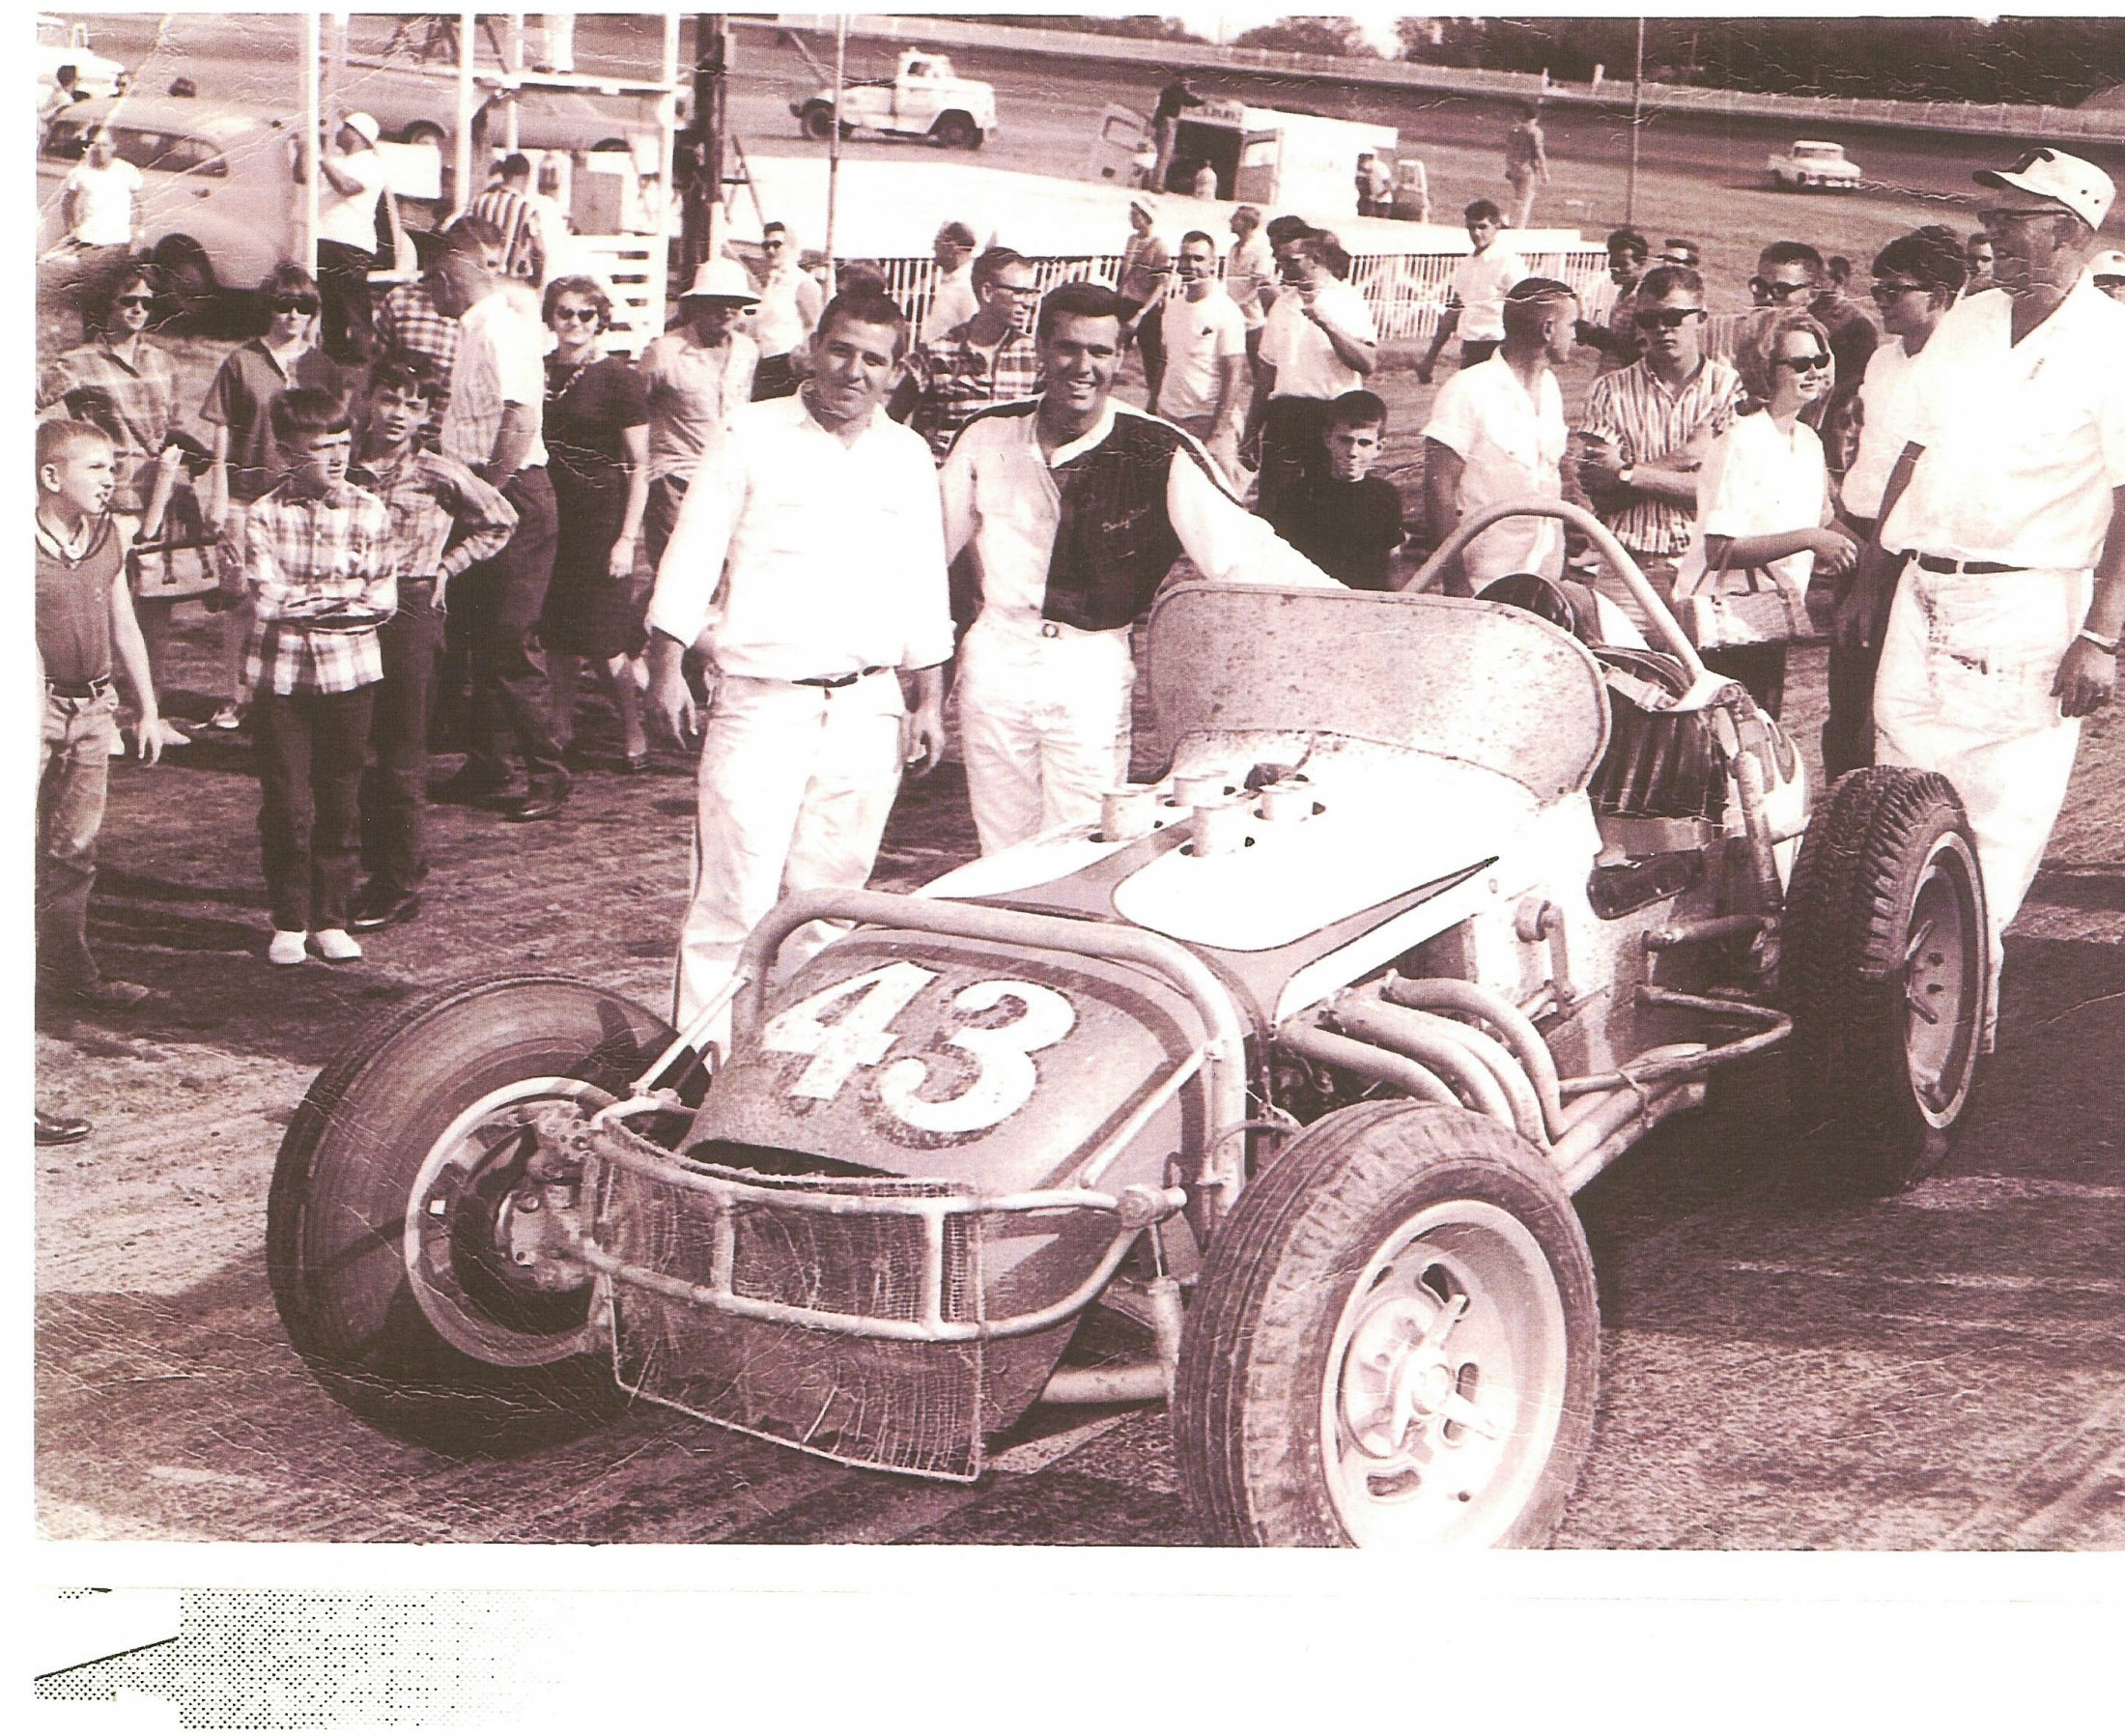 #43 Champ Car - Belleville, 1965